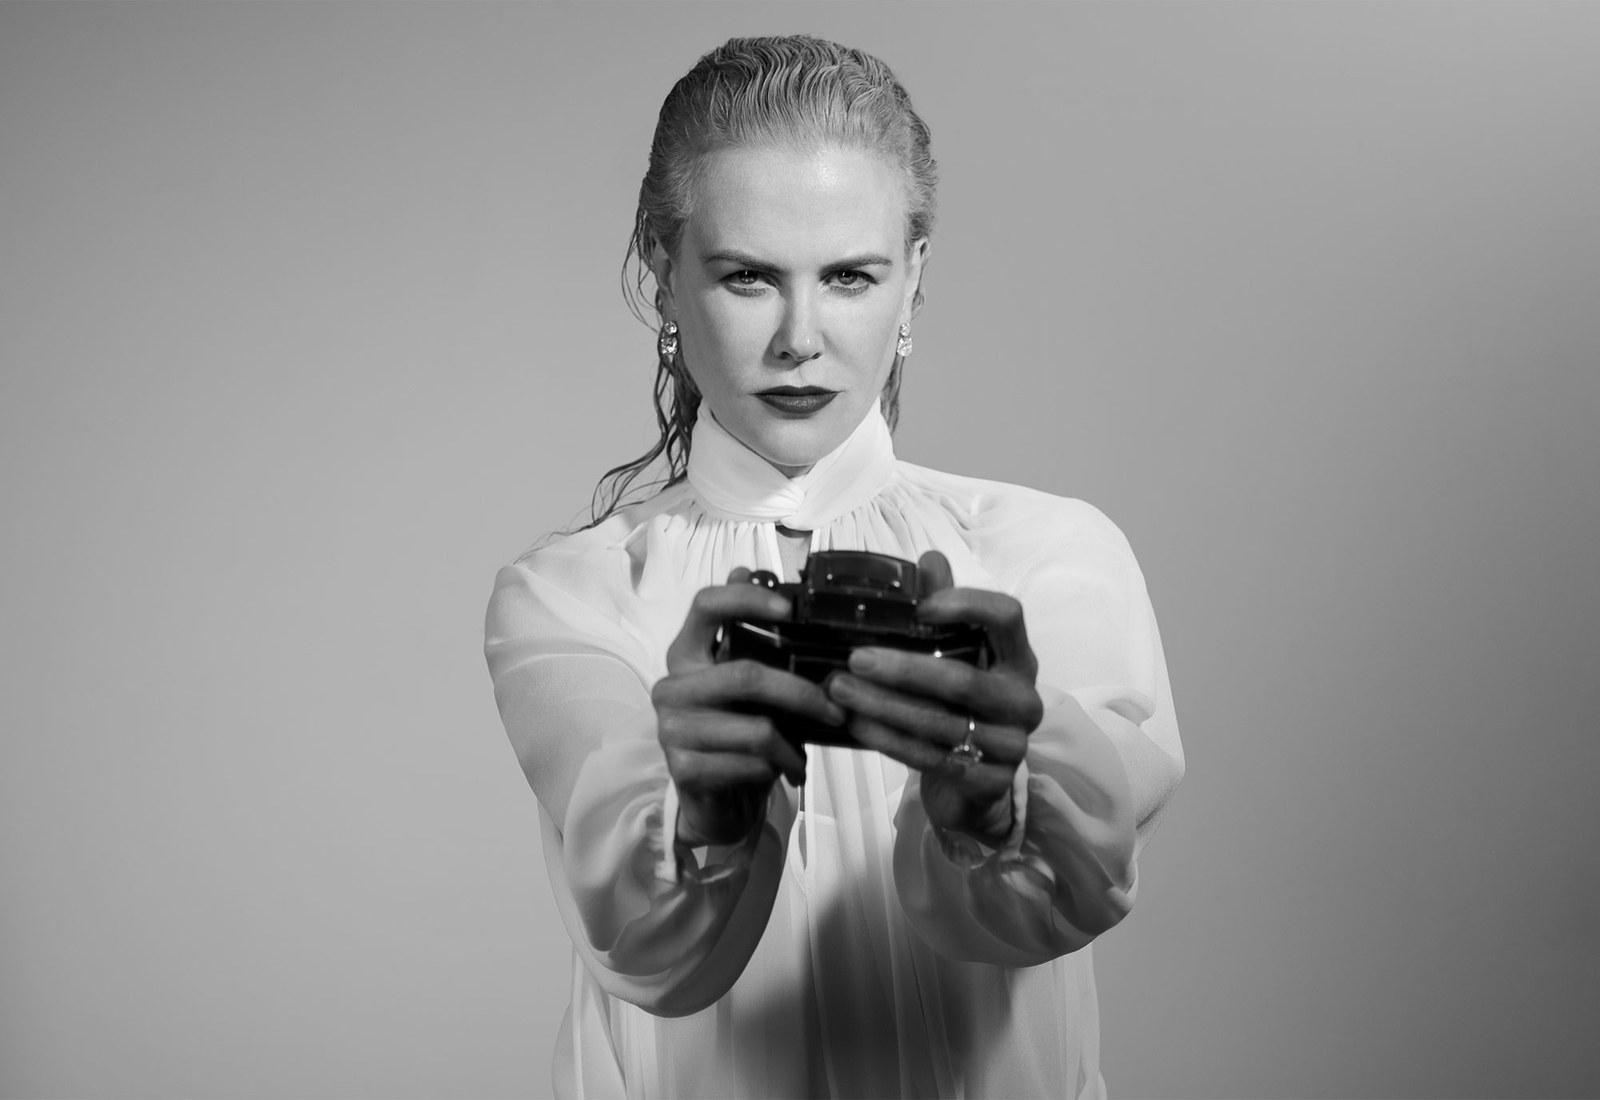 Nicole Kidman by Collier Schorr for Vanity Fair US May 2019 (3).jpg